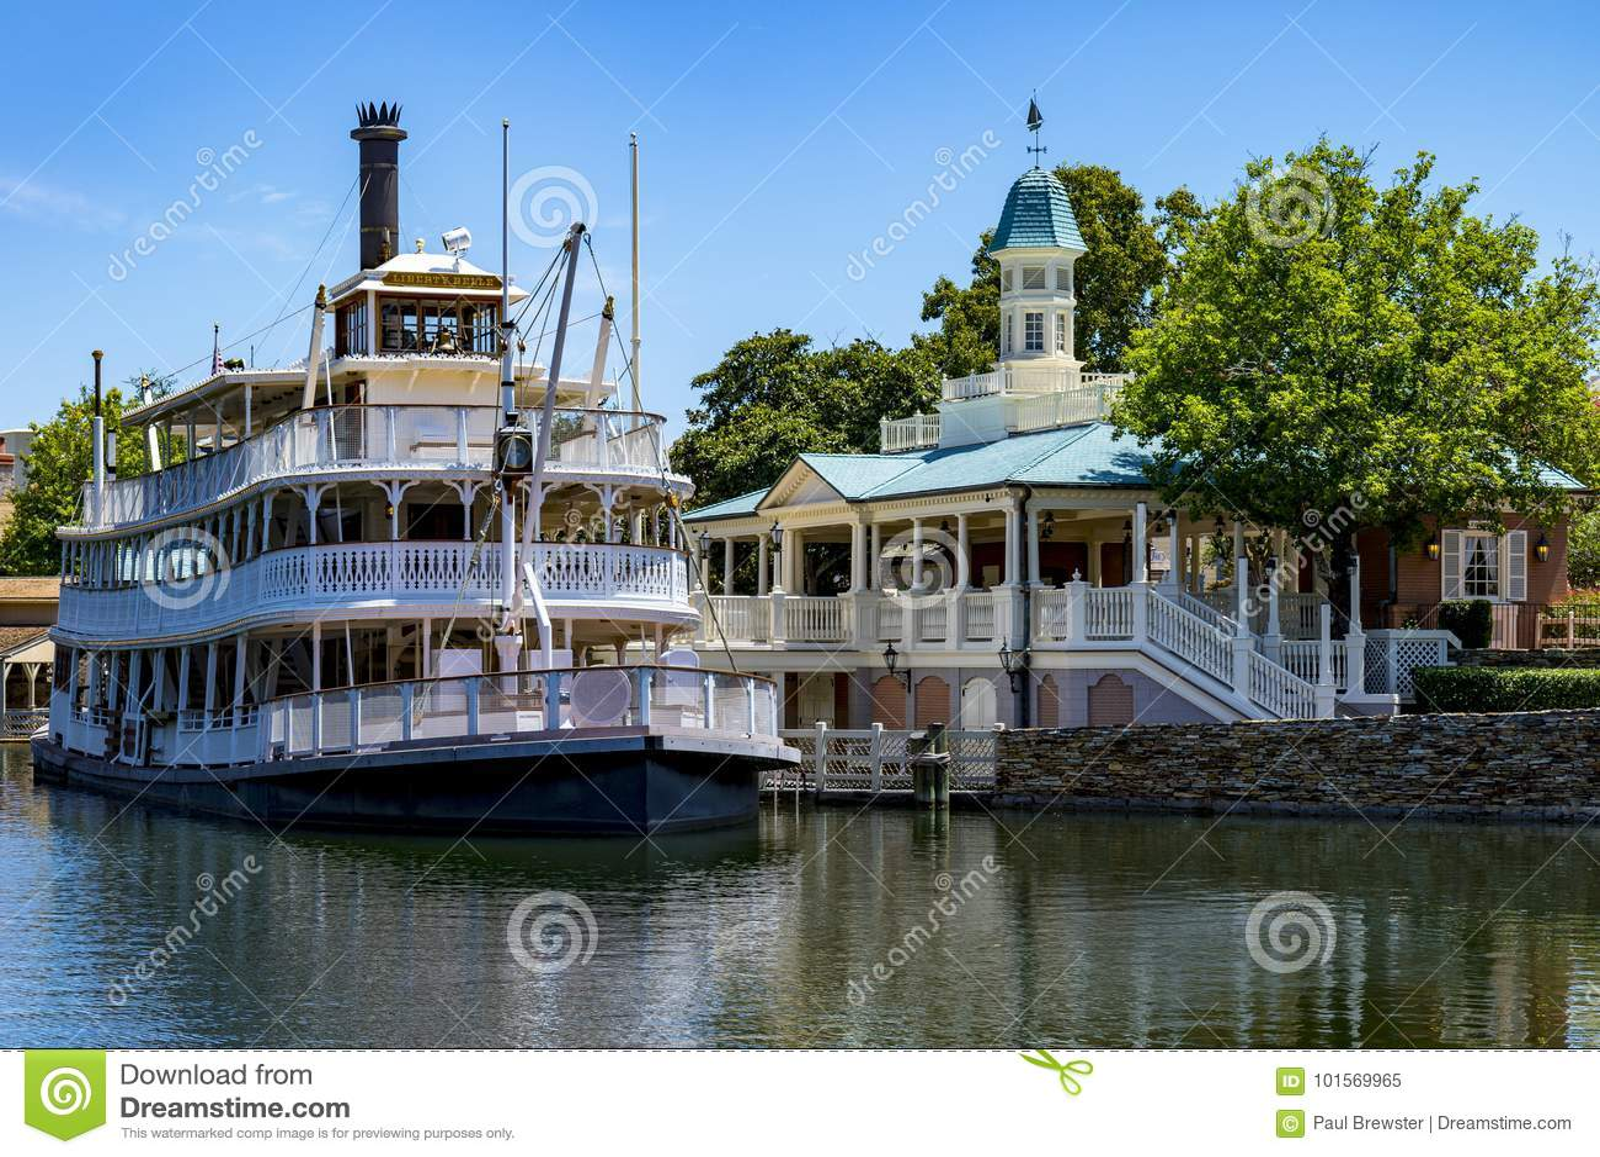 Disney world Mississippi paddle steamer boat orlando Florida